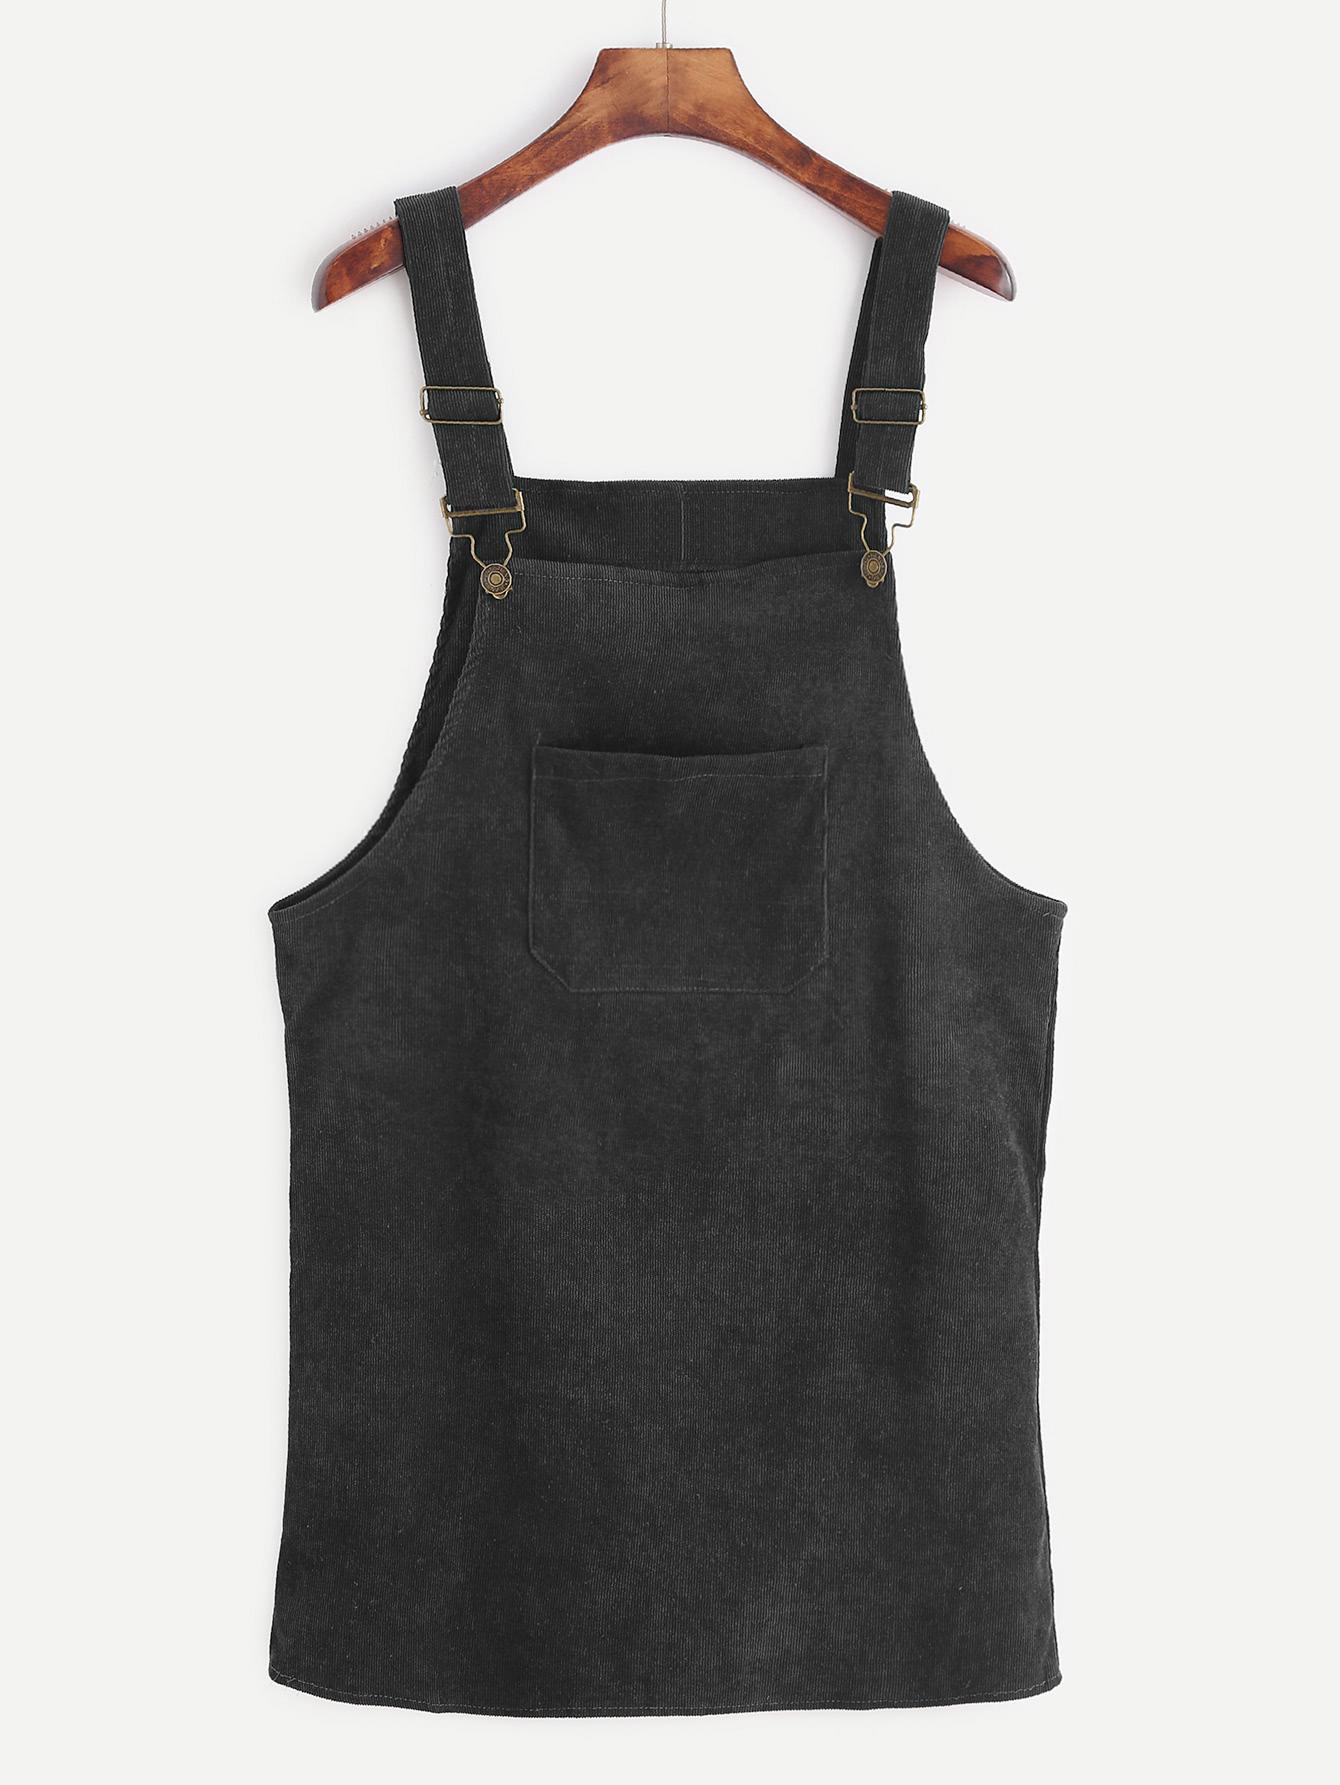 Black Corduroy Overall Dress With Pocket dress161208108